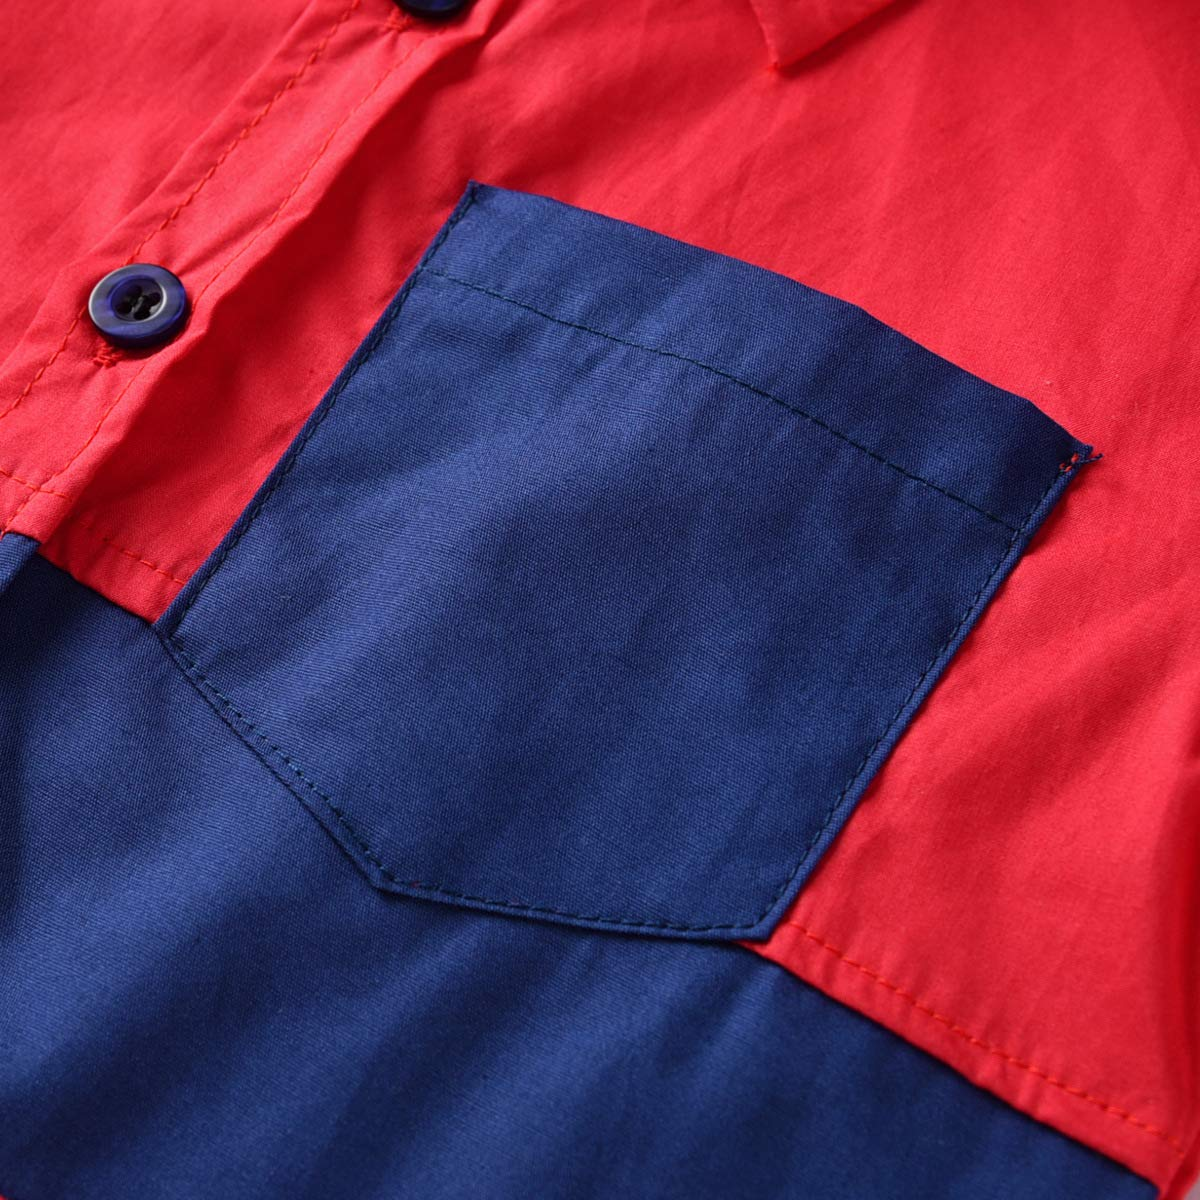 Toddler Baby Boys Gentleman Flag Bowtie Plaid Shirt Suspenders Outfit Suit Set